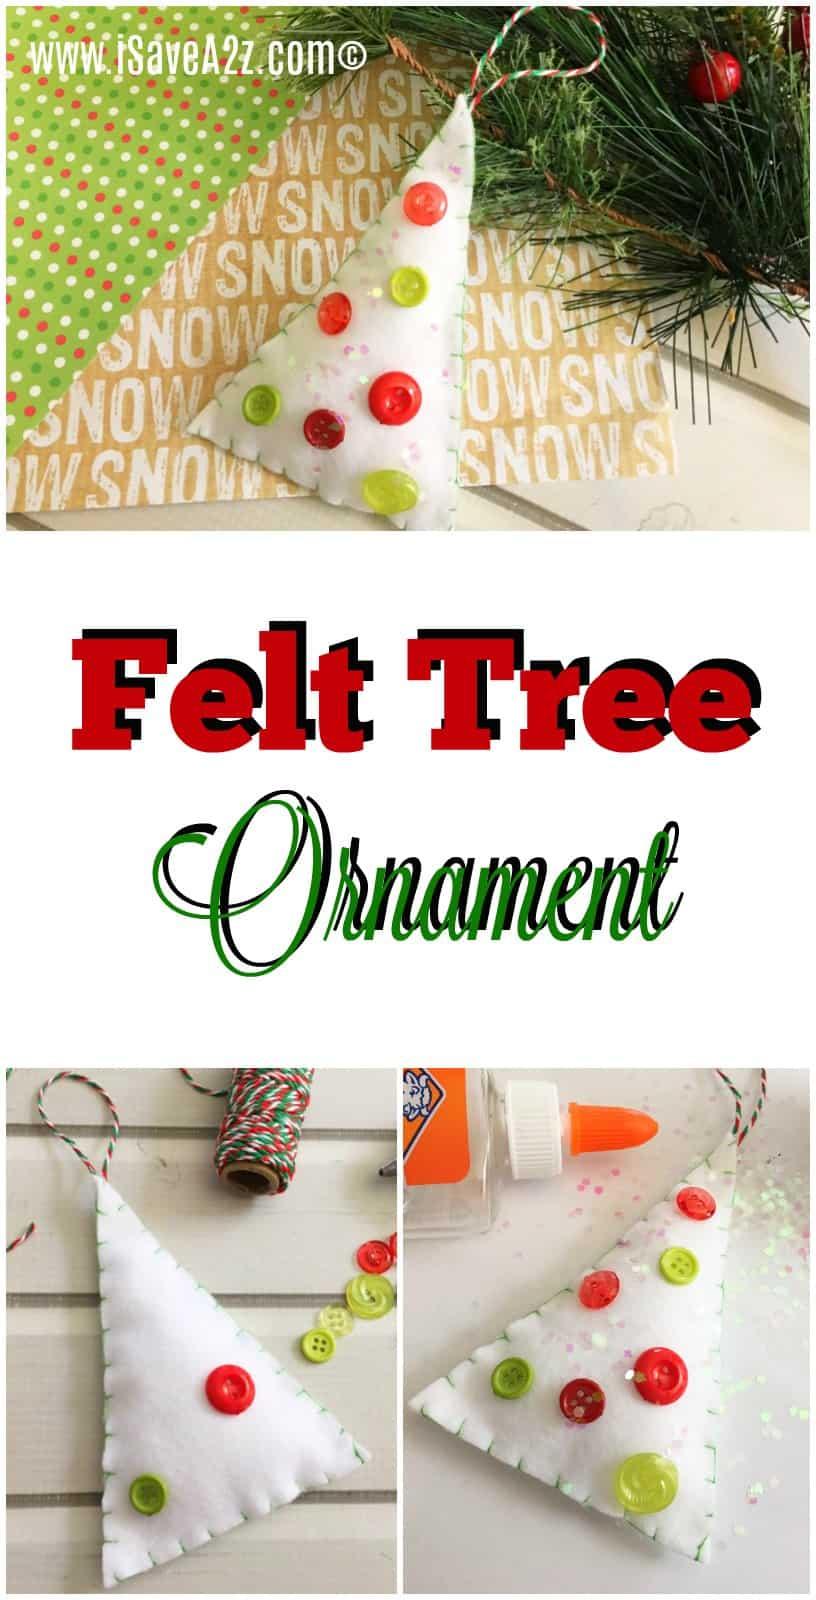 Felt Tree Ornament Craft Idea